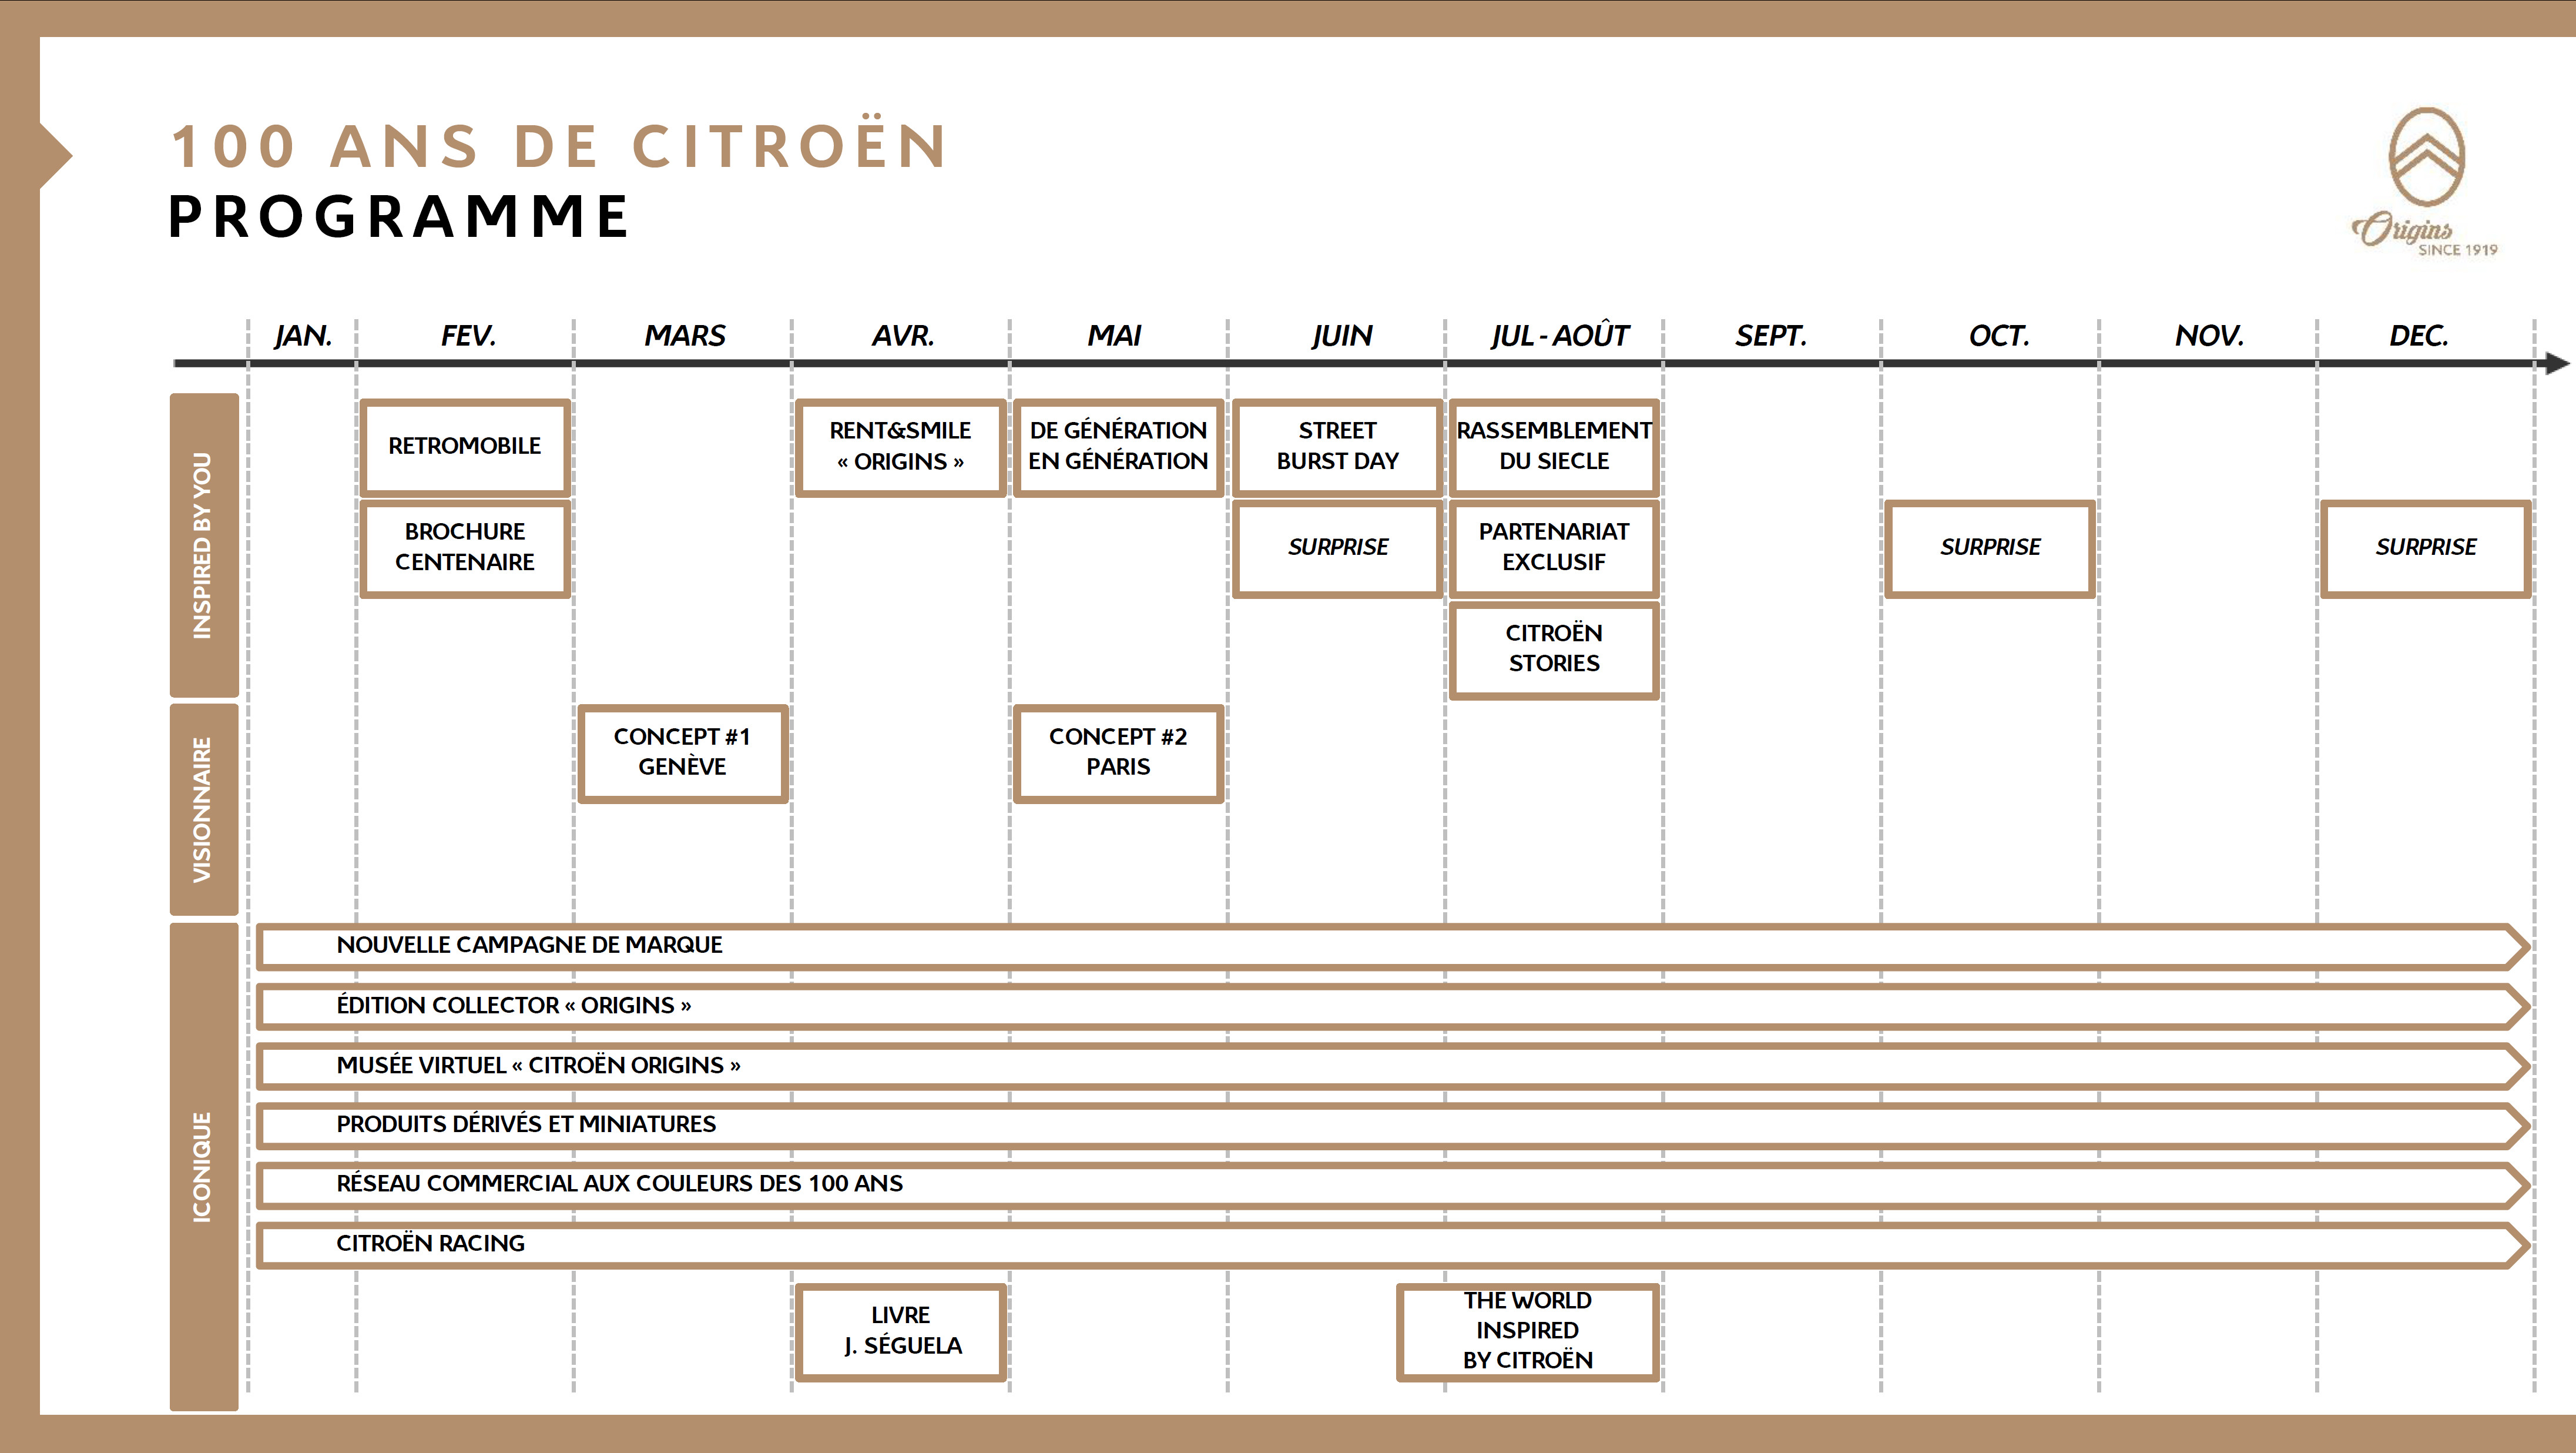 2019 - [Citroën] 19_19 3d5fff_8f750d518fa04f60a987e3416765d62d~mv2_d_4384_2472_s_4_2